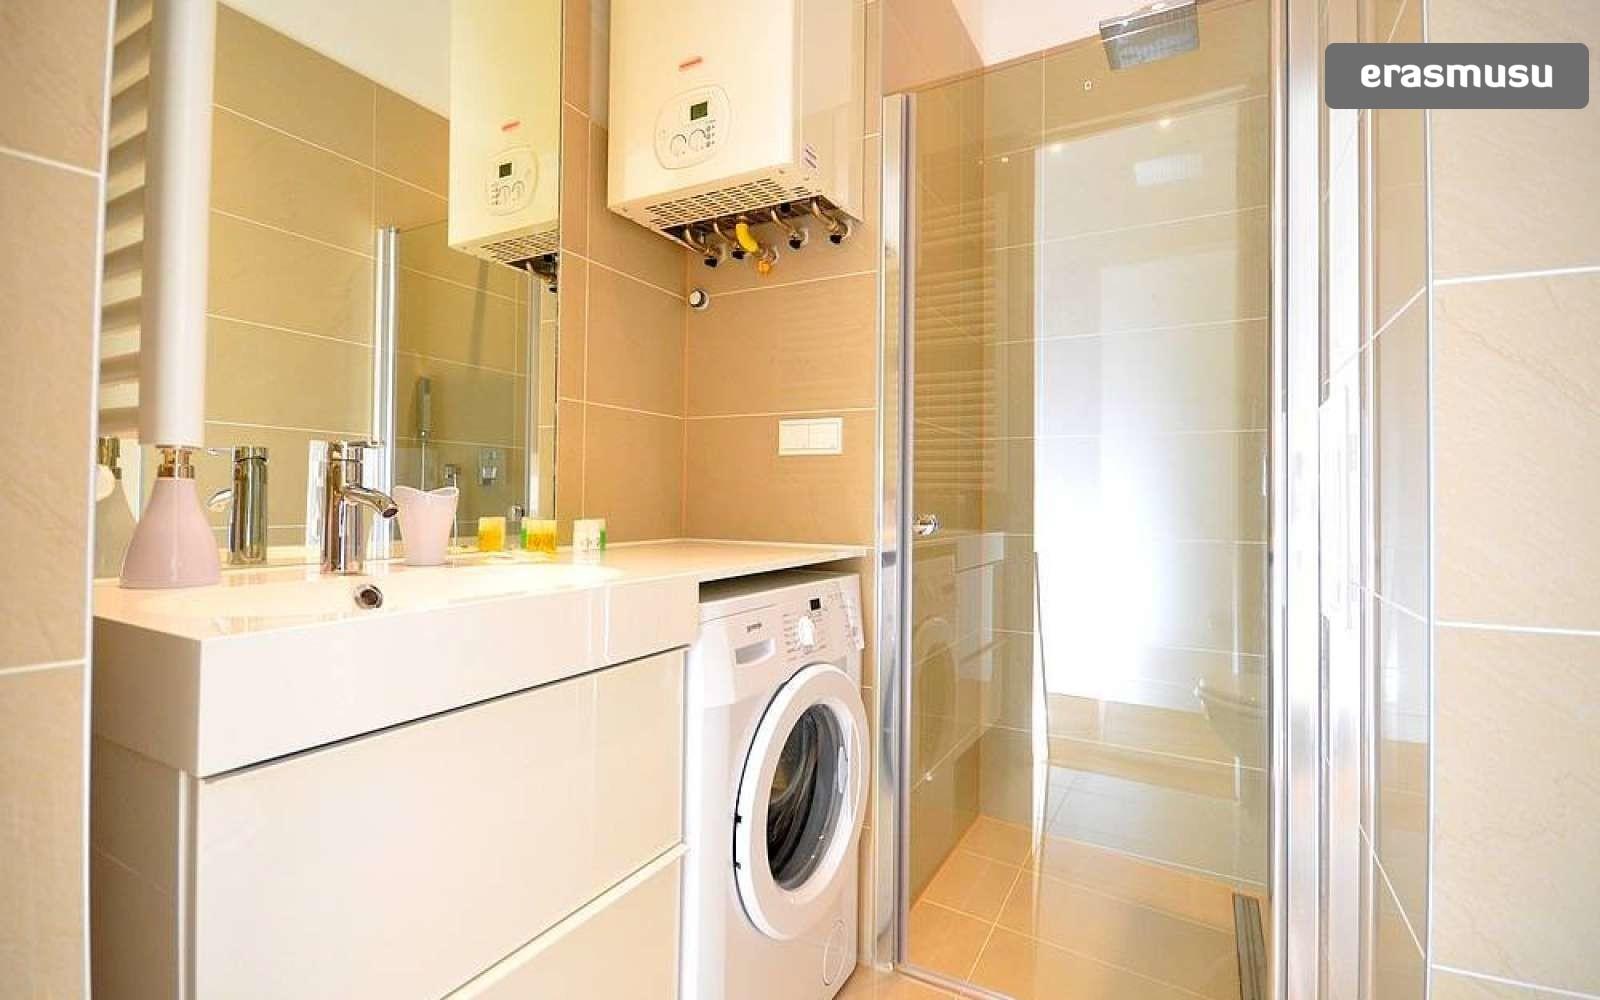 studio-apartment-rent-rudolfsheim-funfhaus-bccf07a94ce1933815787